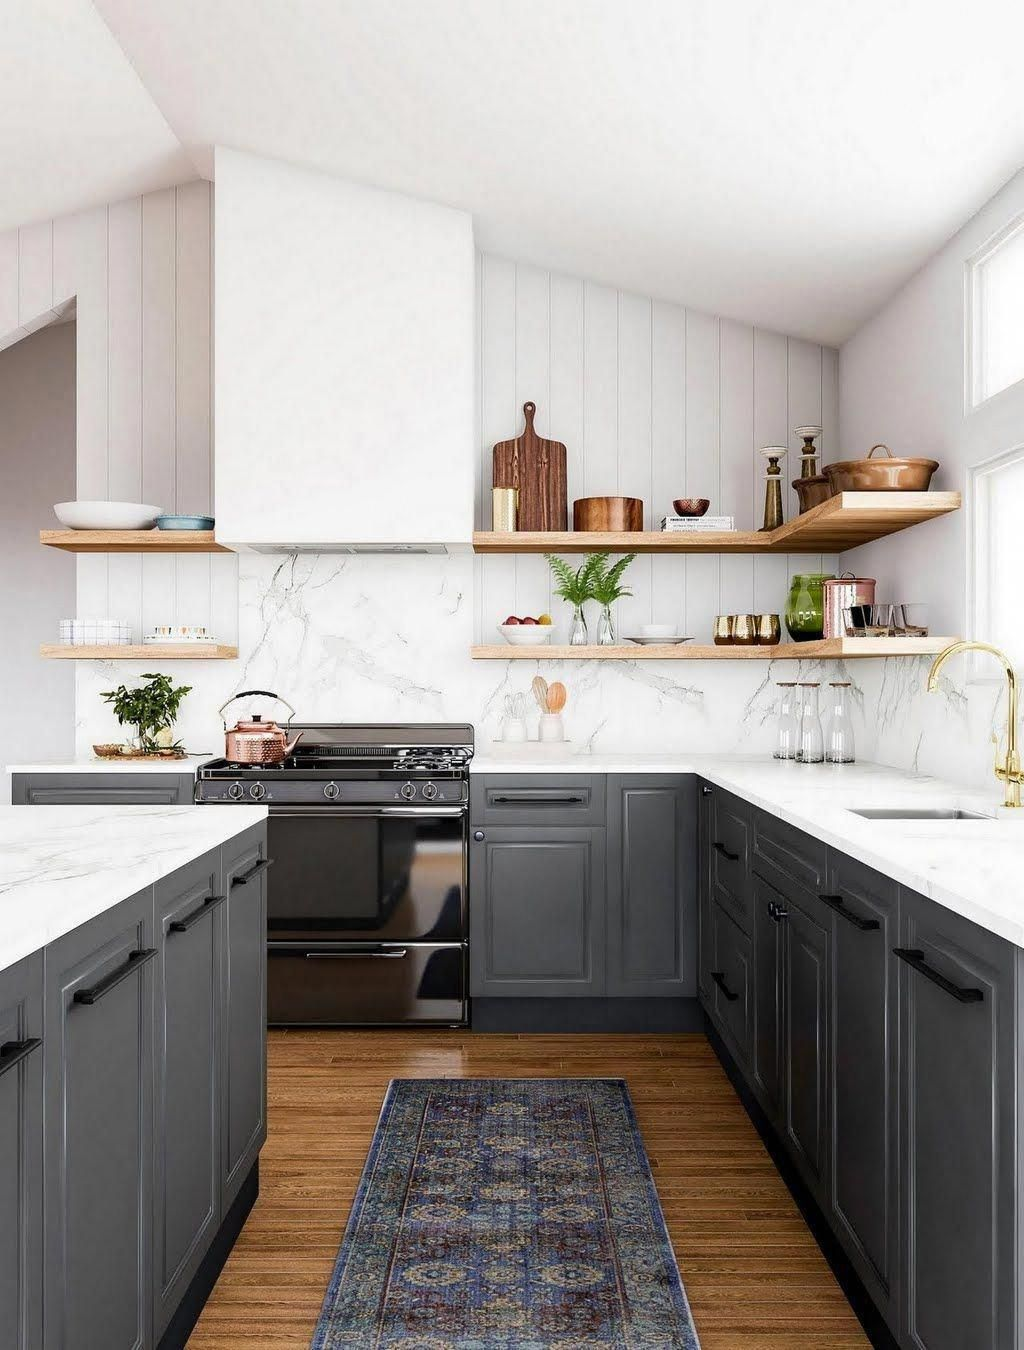 Find Out More On Awesome Kitchen Cabinets Diy Kitchenideasmai Kitchenremodelhouston Kitchenre New Kitchen Cabinets Kitchen Renovation Kitchen Cabinet Design